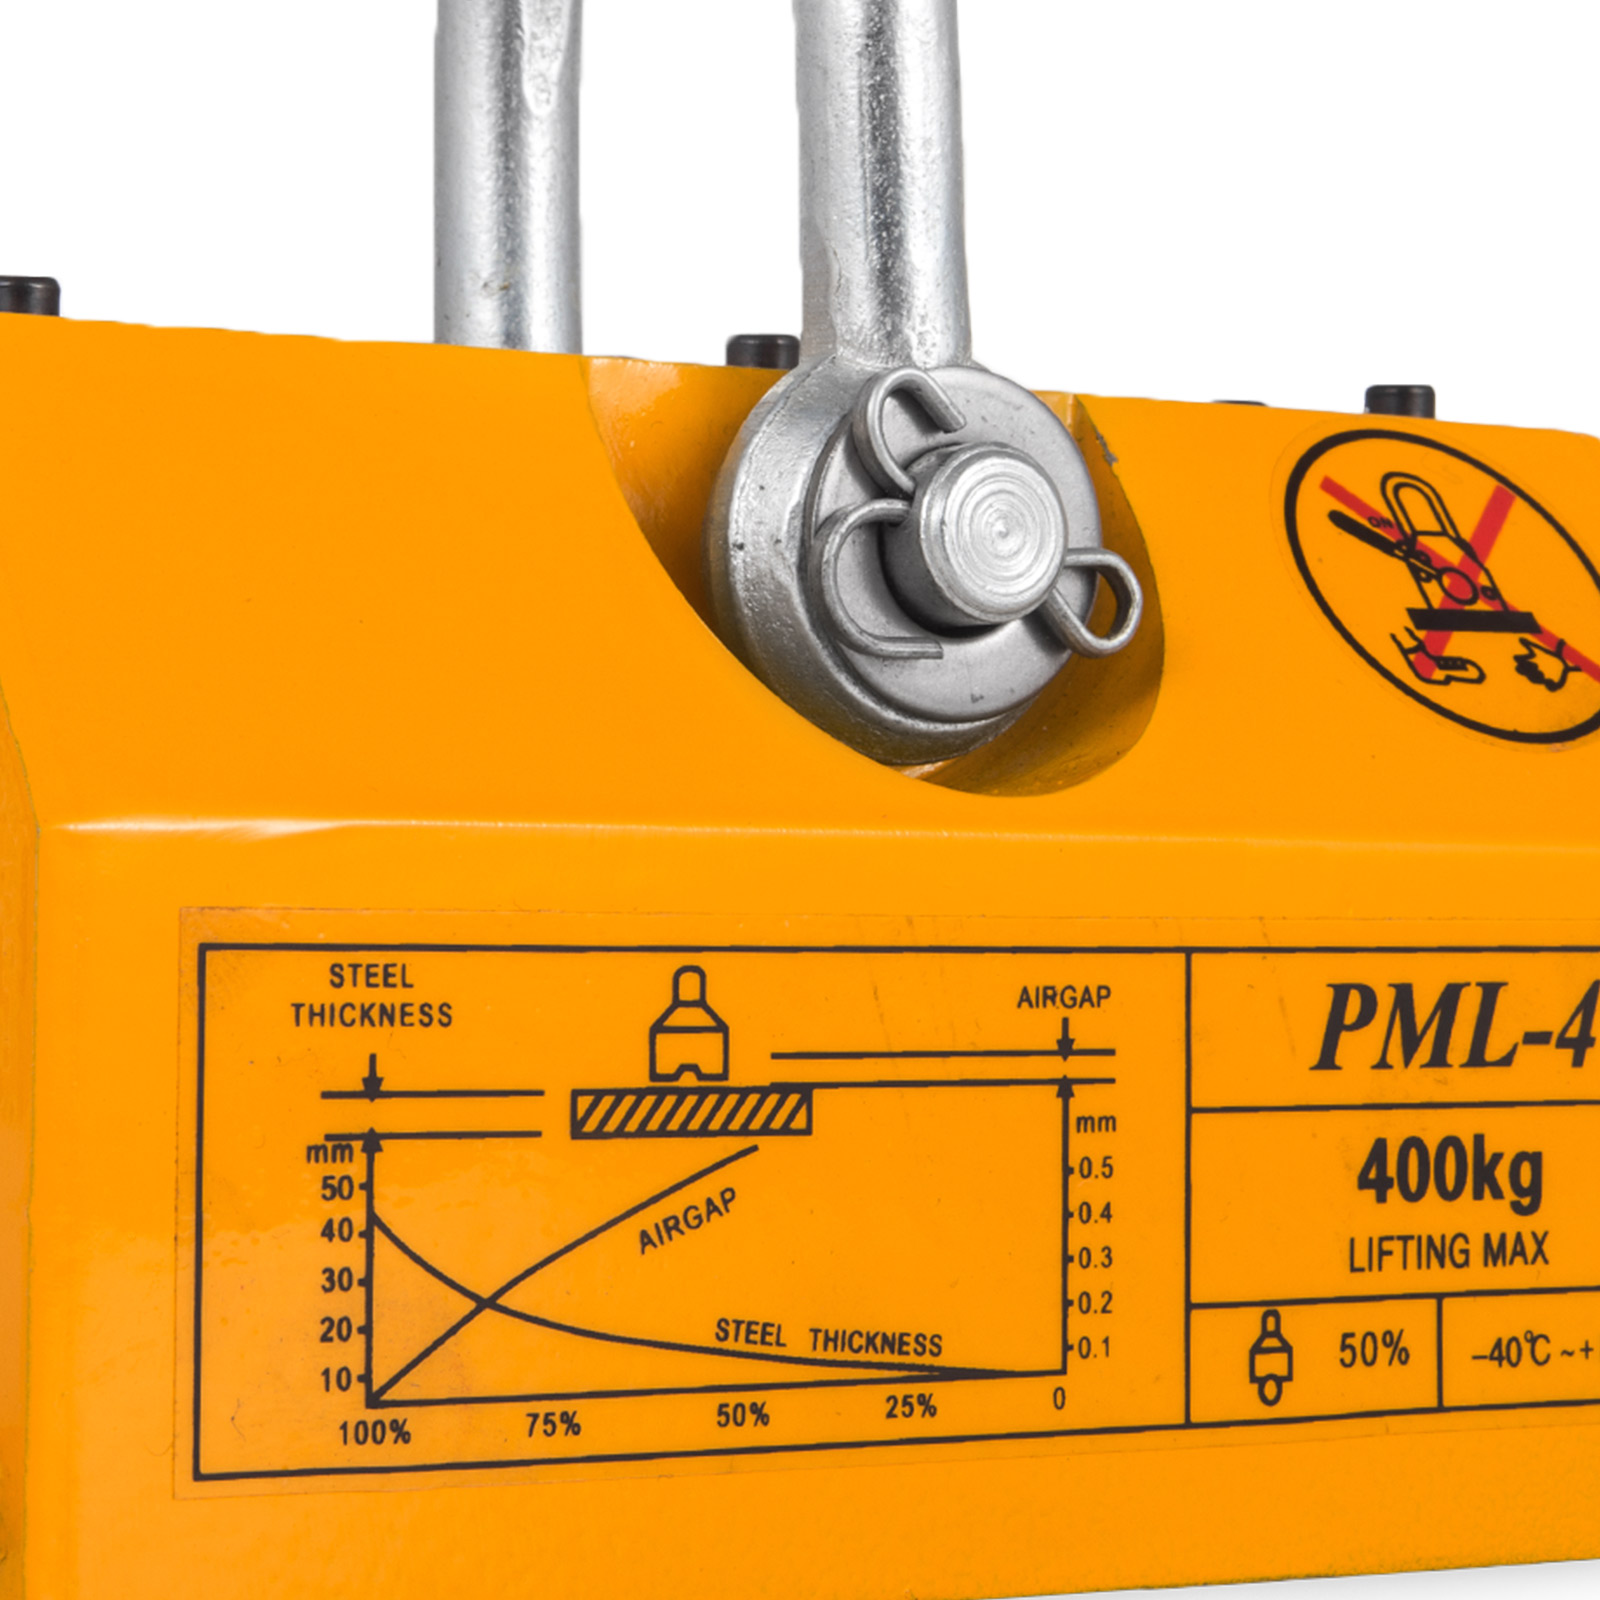 100-300-600-1000KG-Steel-Magnetic-Lifter-Heavy-Duty-Crane-Hoist-Lifting-Magnet miniature 47